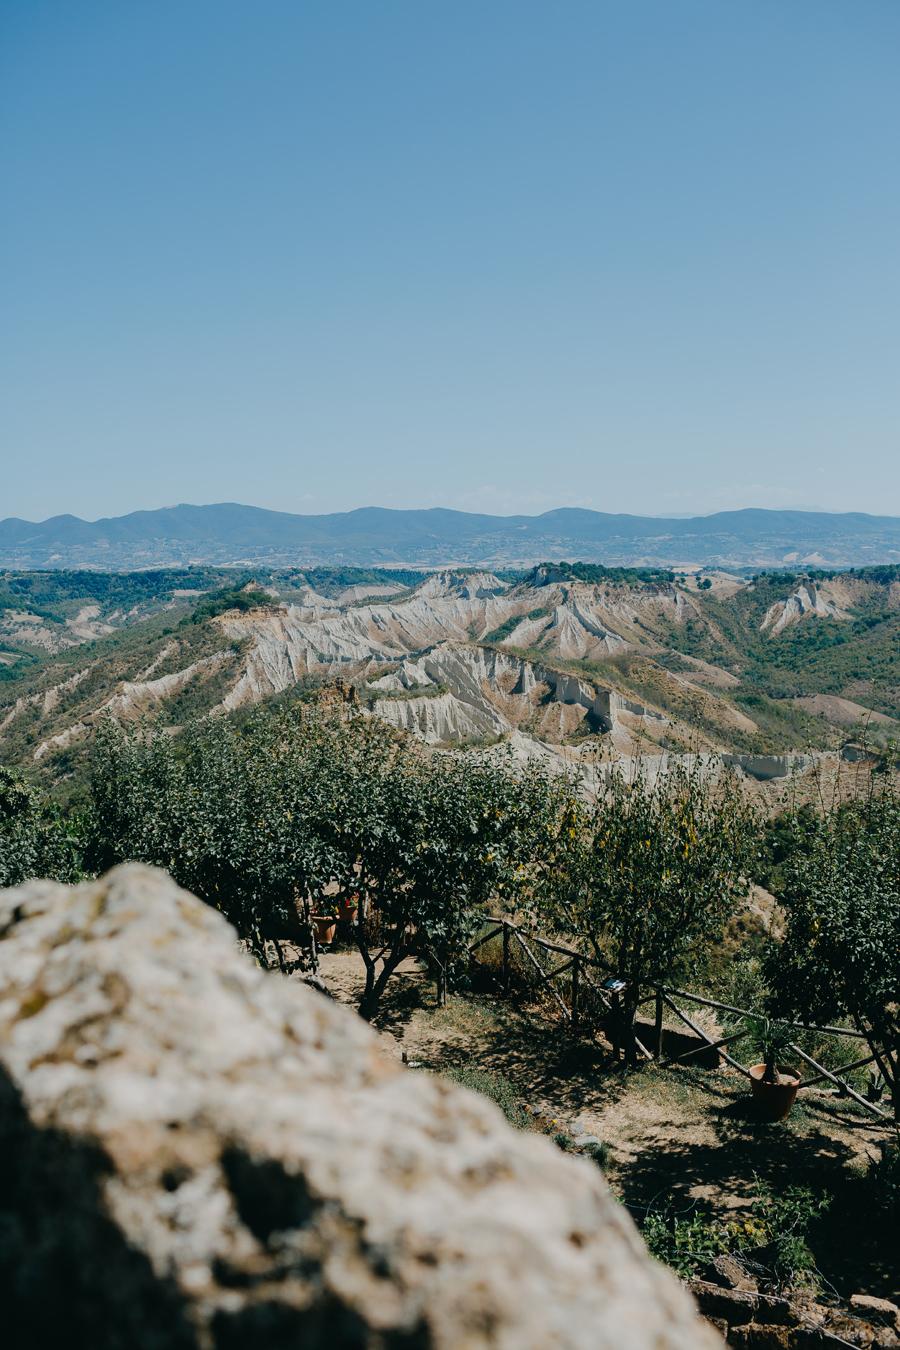 010-italy-rome-civita-orvieto-castle-italia-travel-photography.jpg